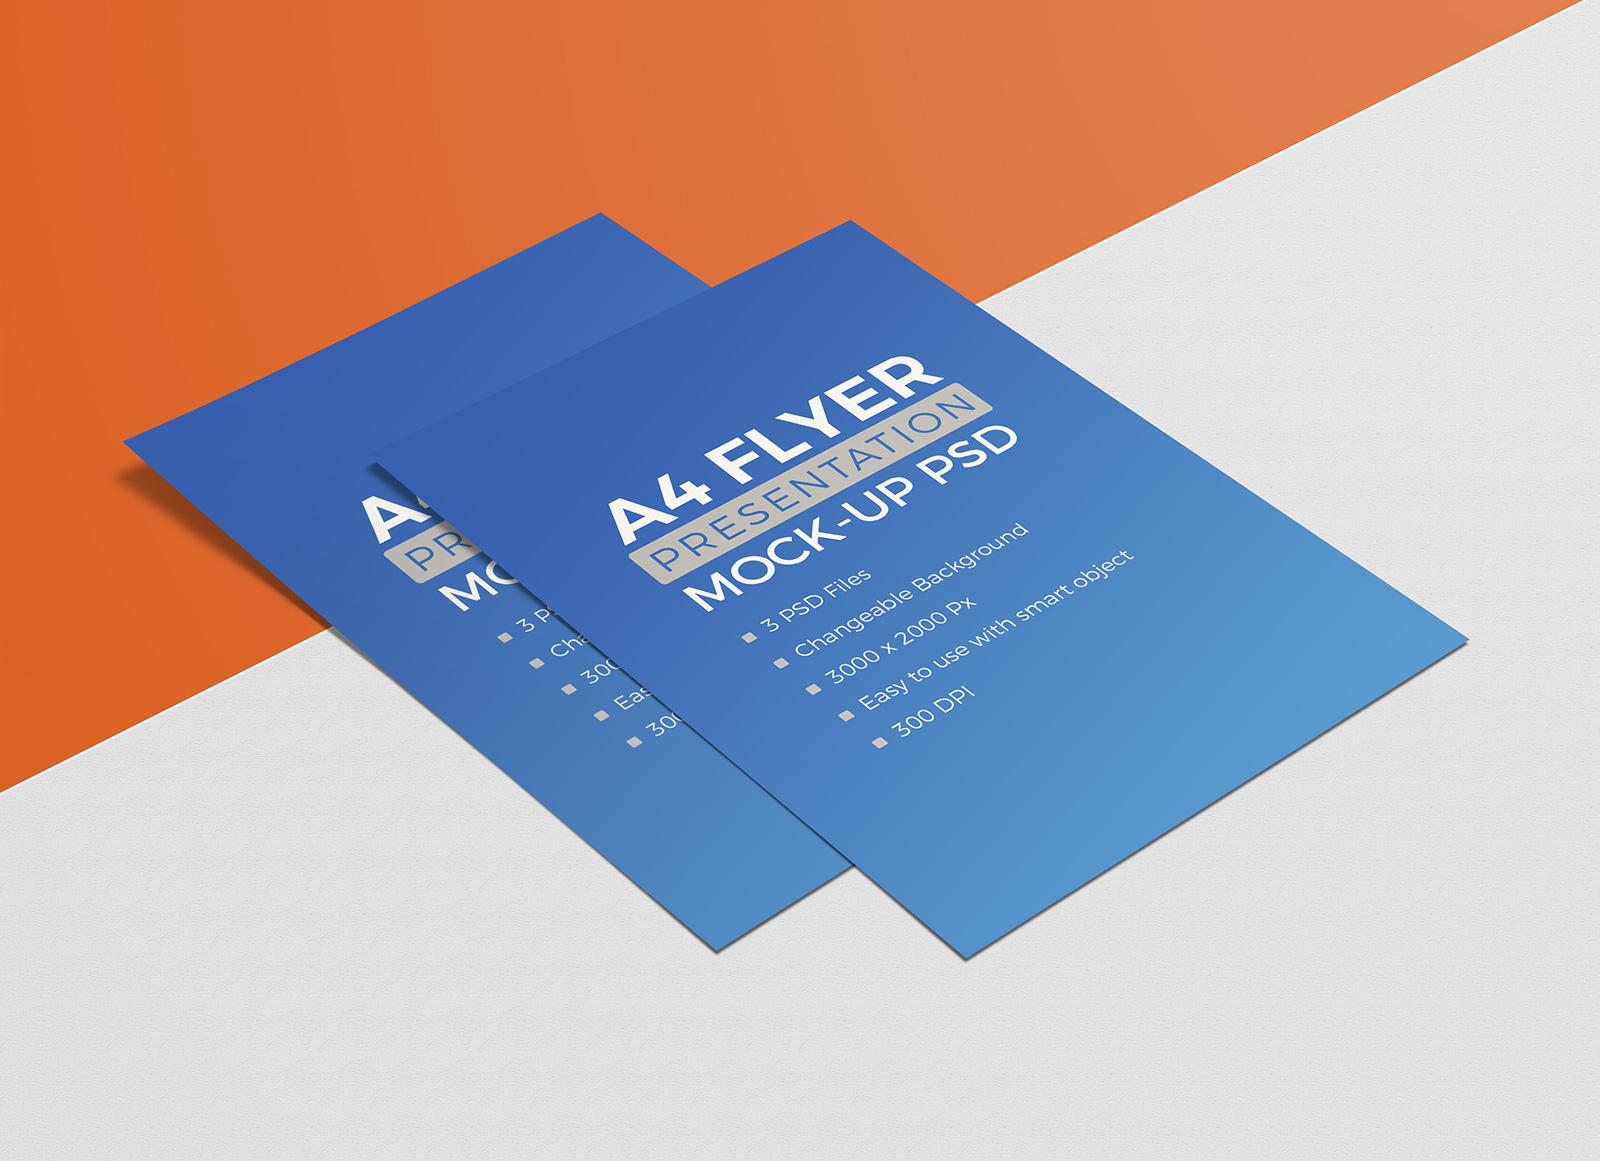 3 Free Premium Quality A4 Size Flyer Resume Mockup Psd Set Good